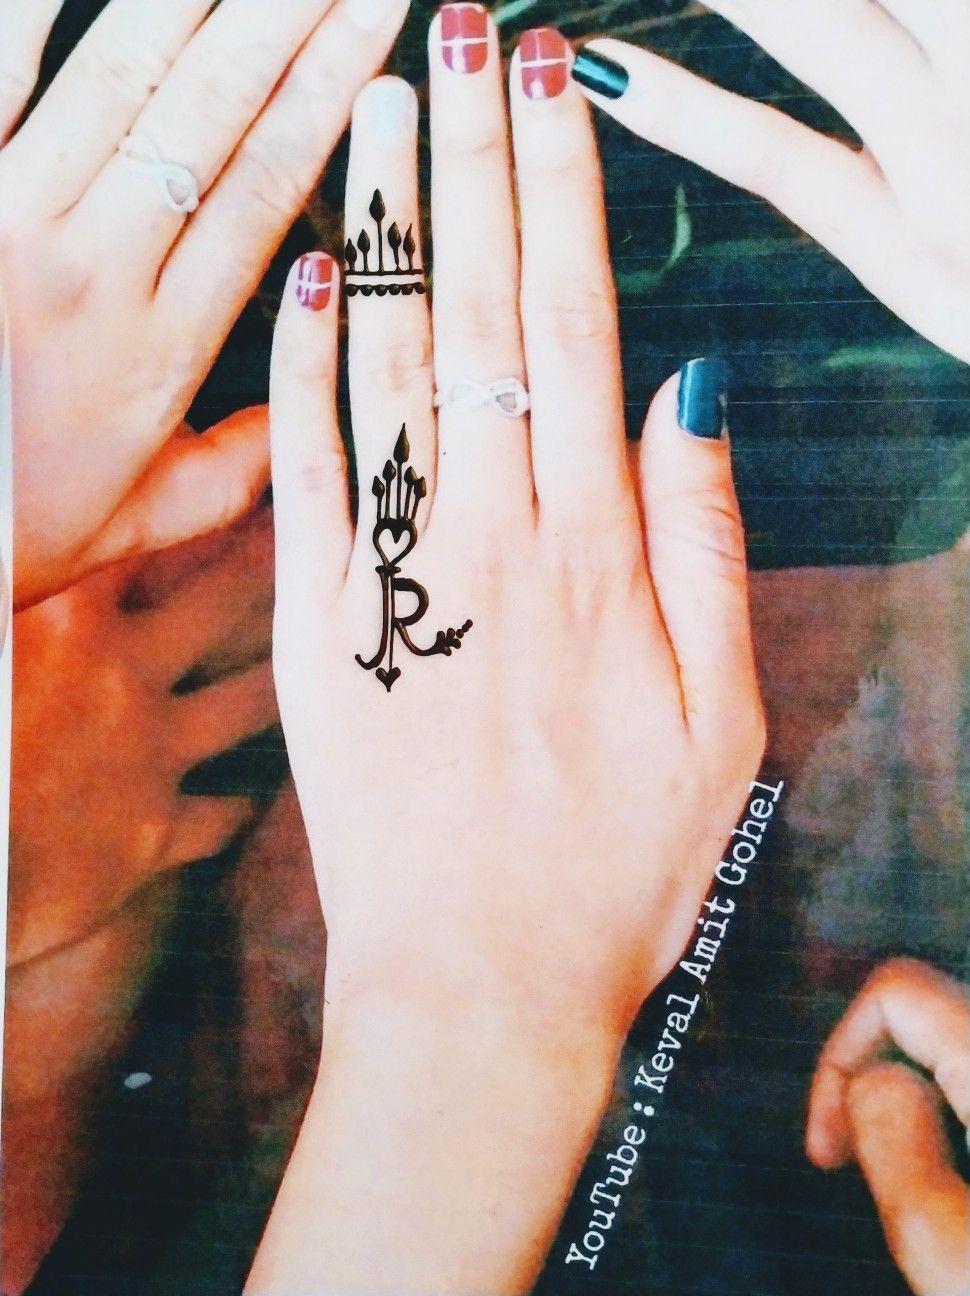 R Letter Mehndi Tattoo Design Mehndi Designs For Fingers Mehndi Designs For Girls Mehndi Art Designs